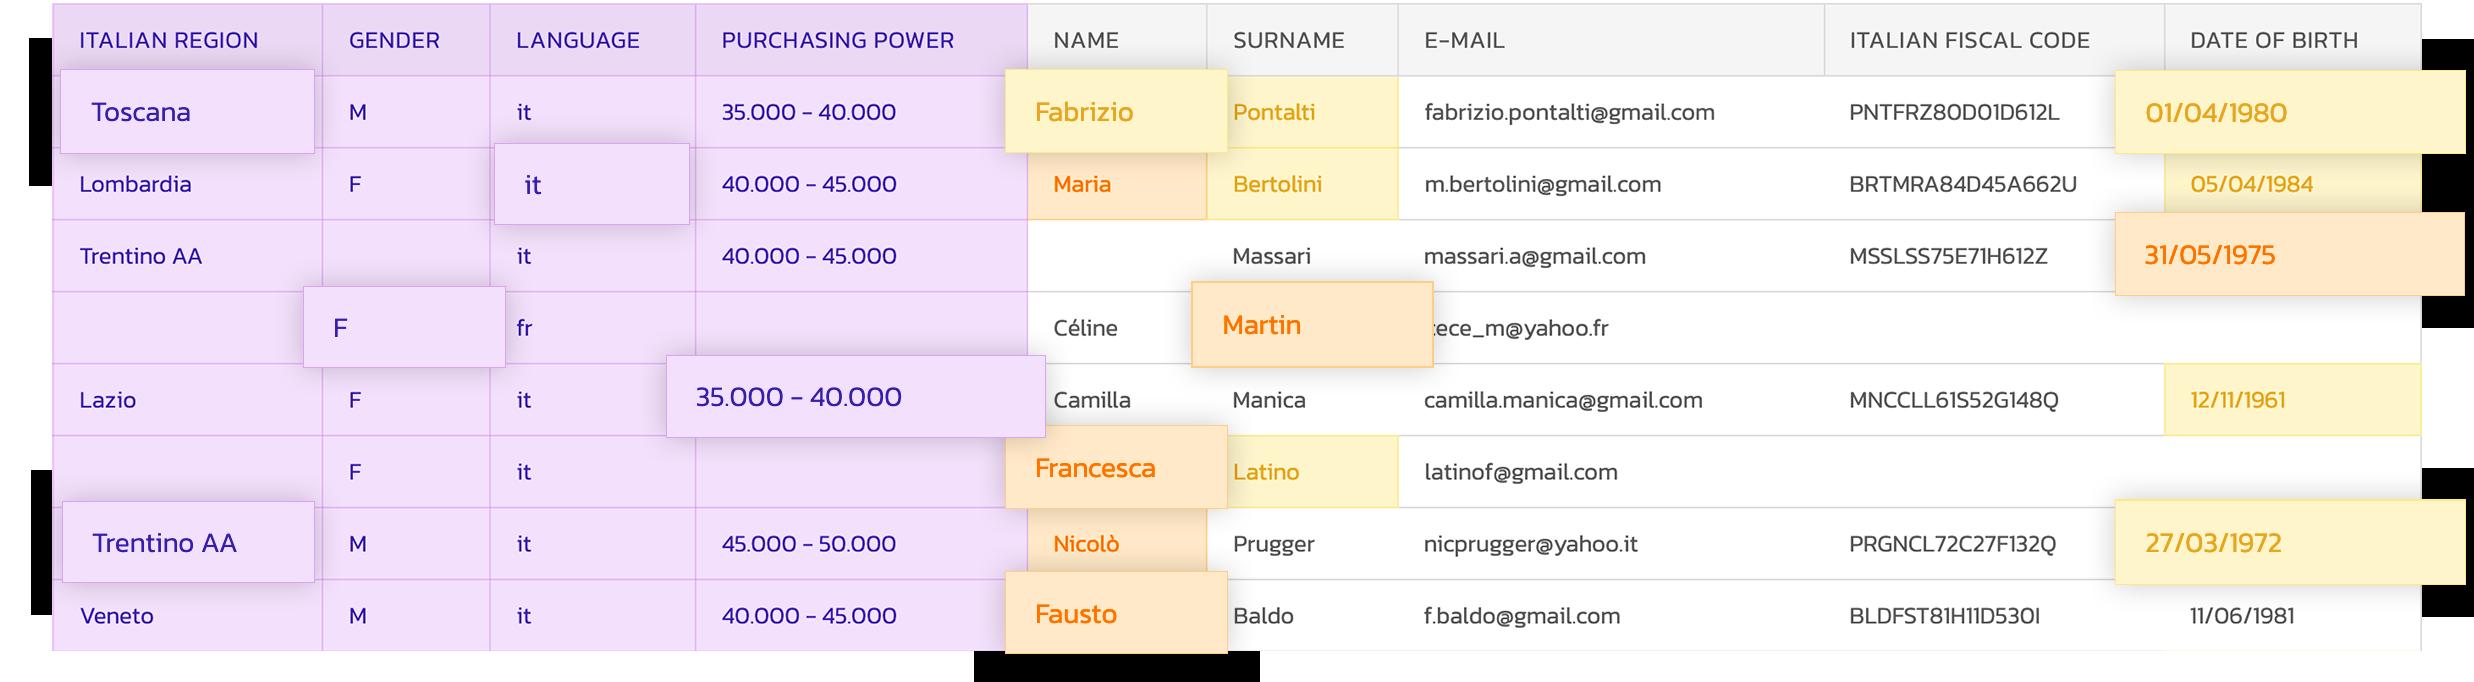 datumo table